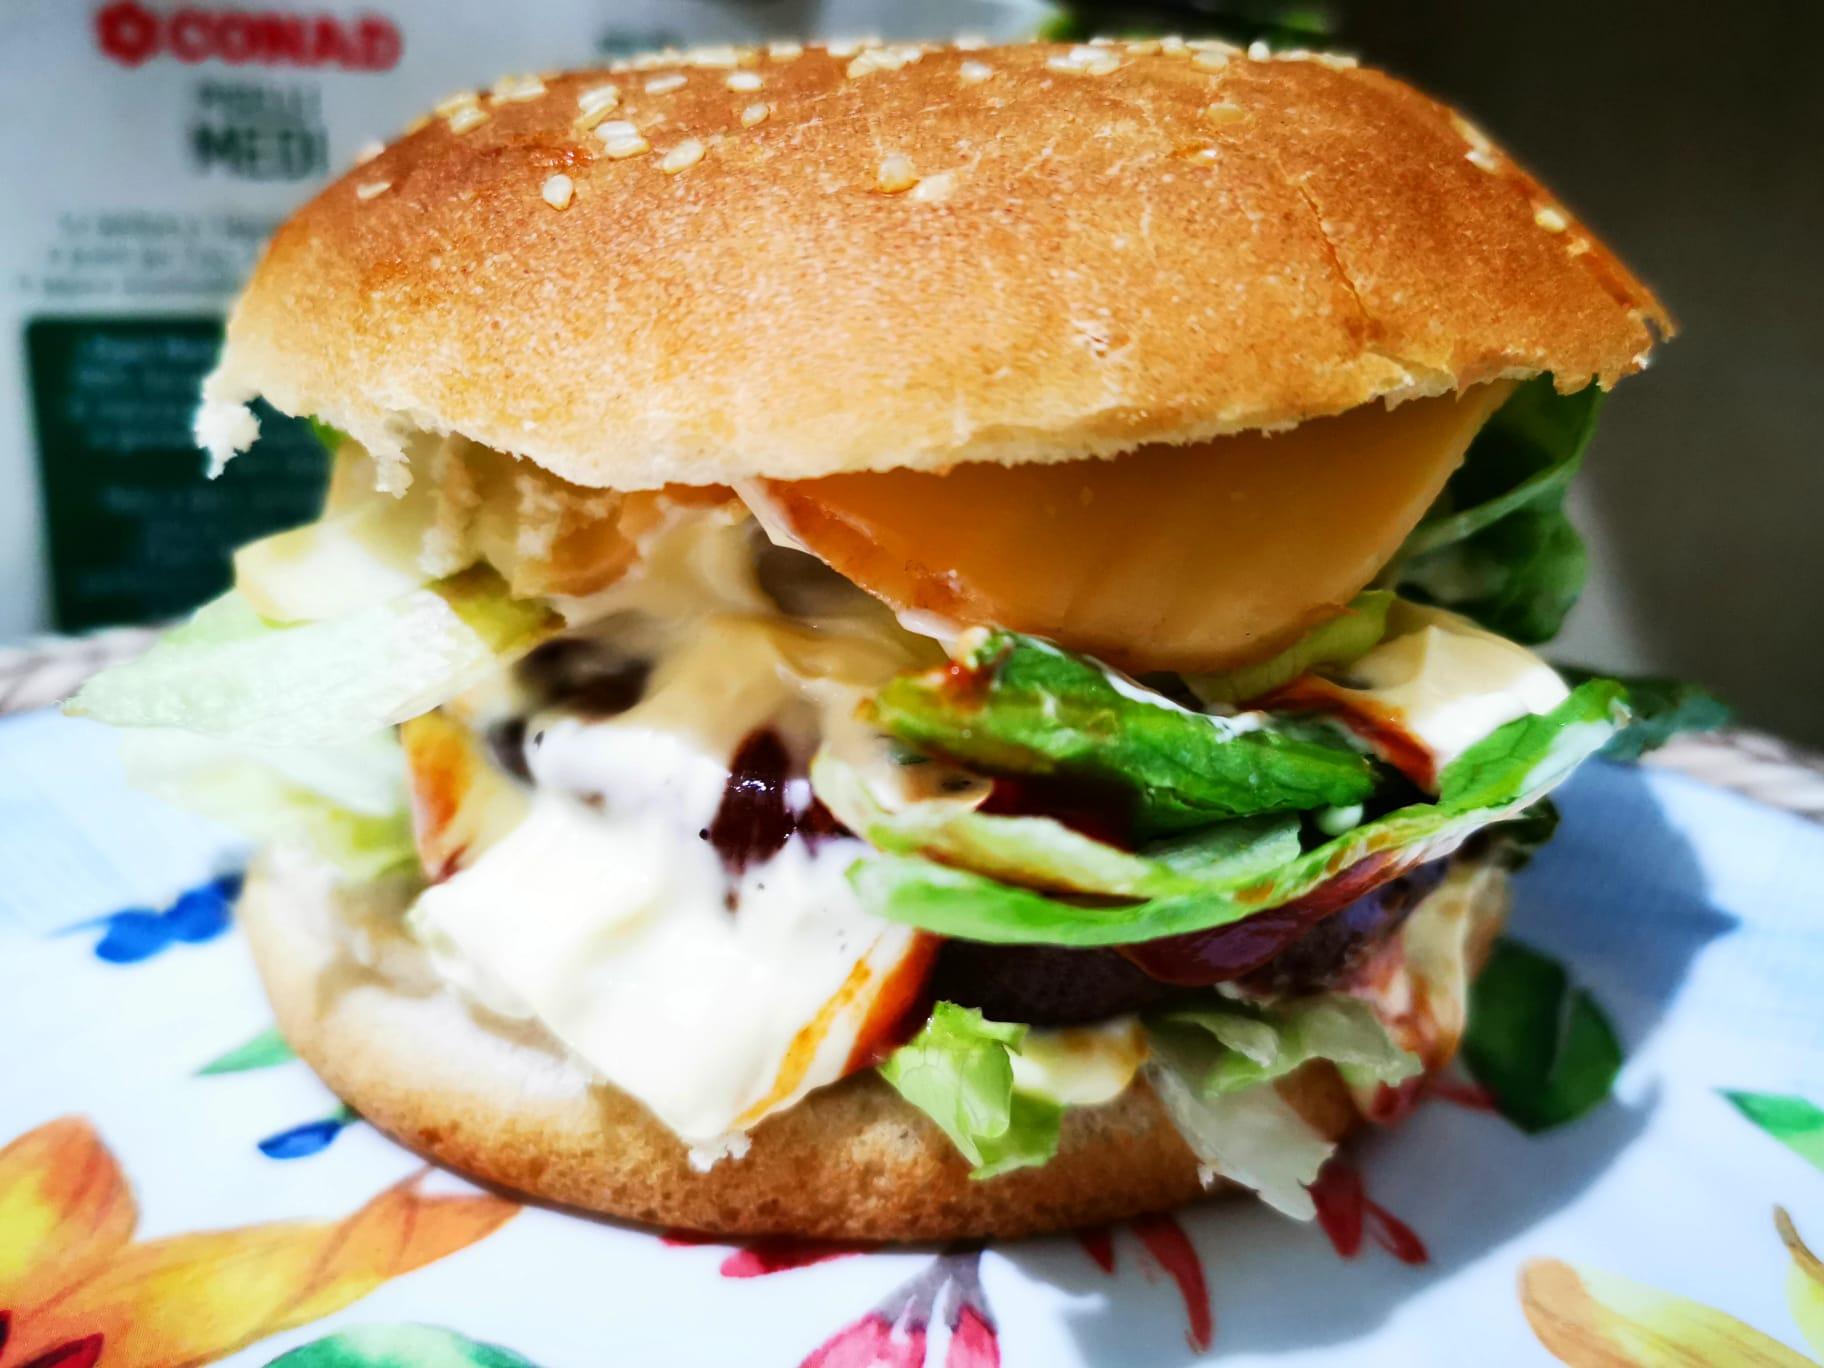 I Black Angus burger preparati da Ramy